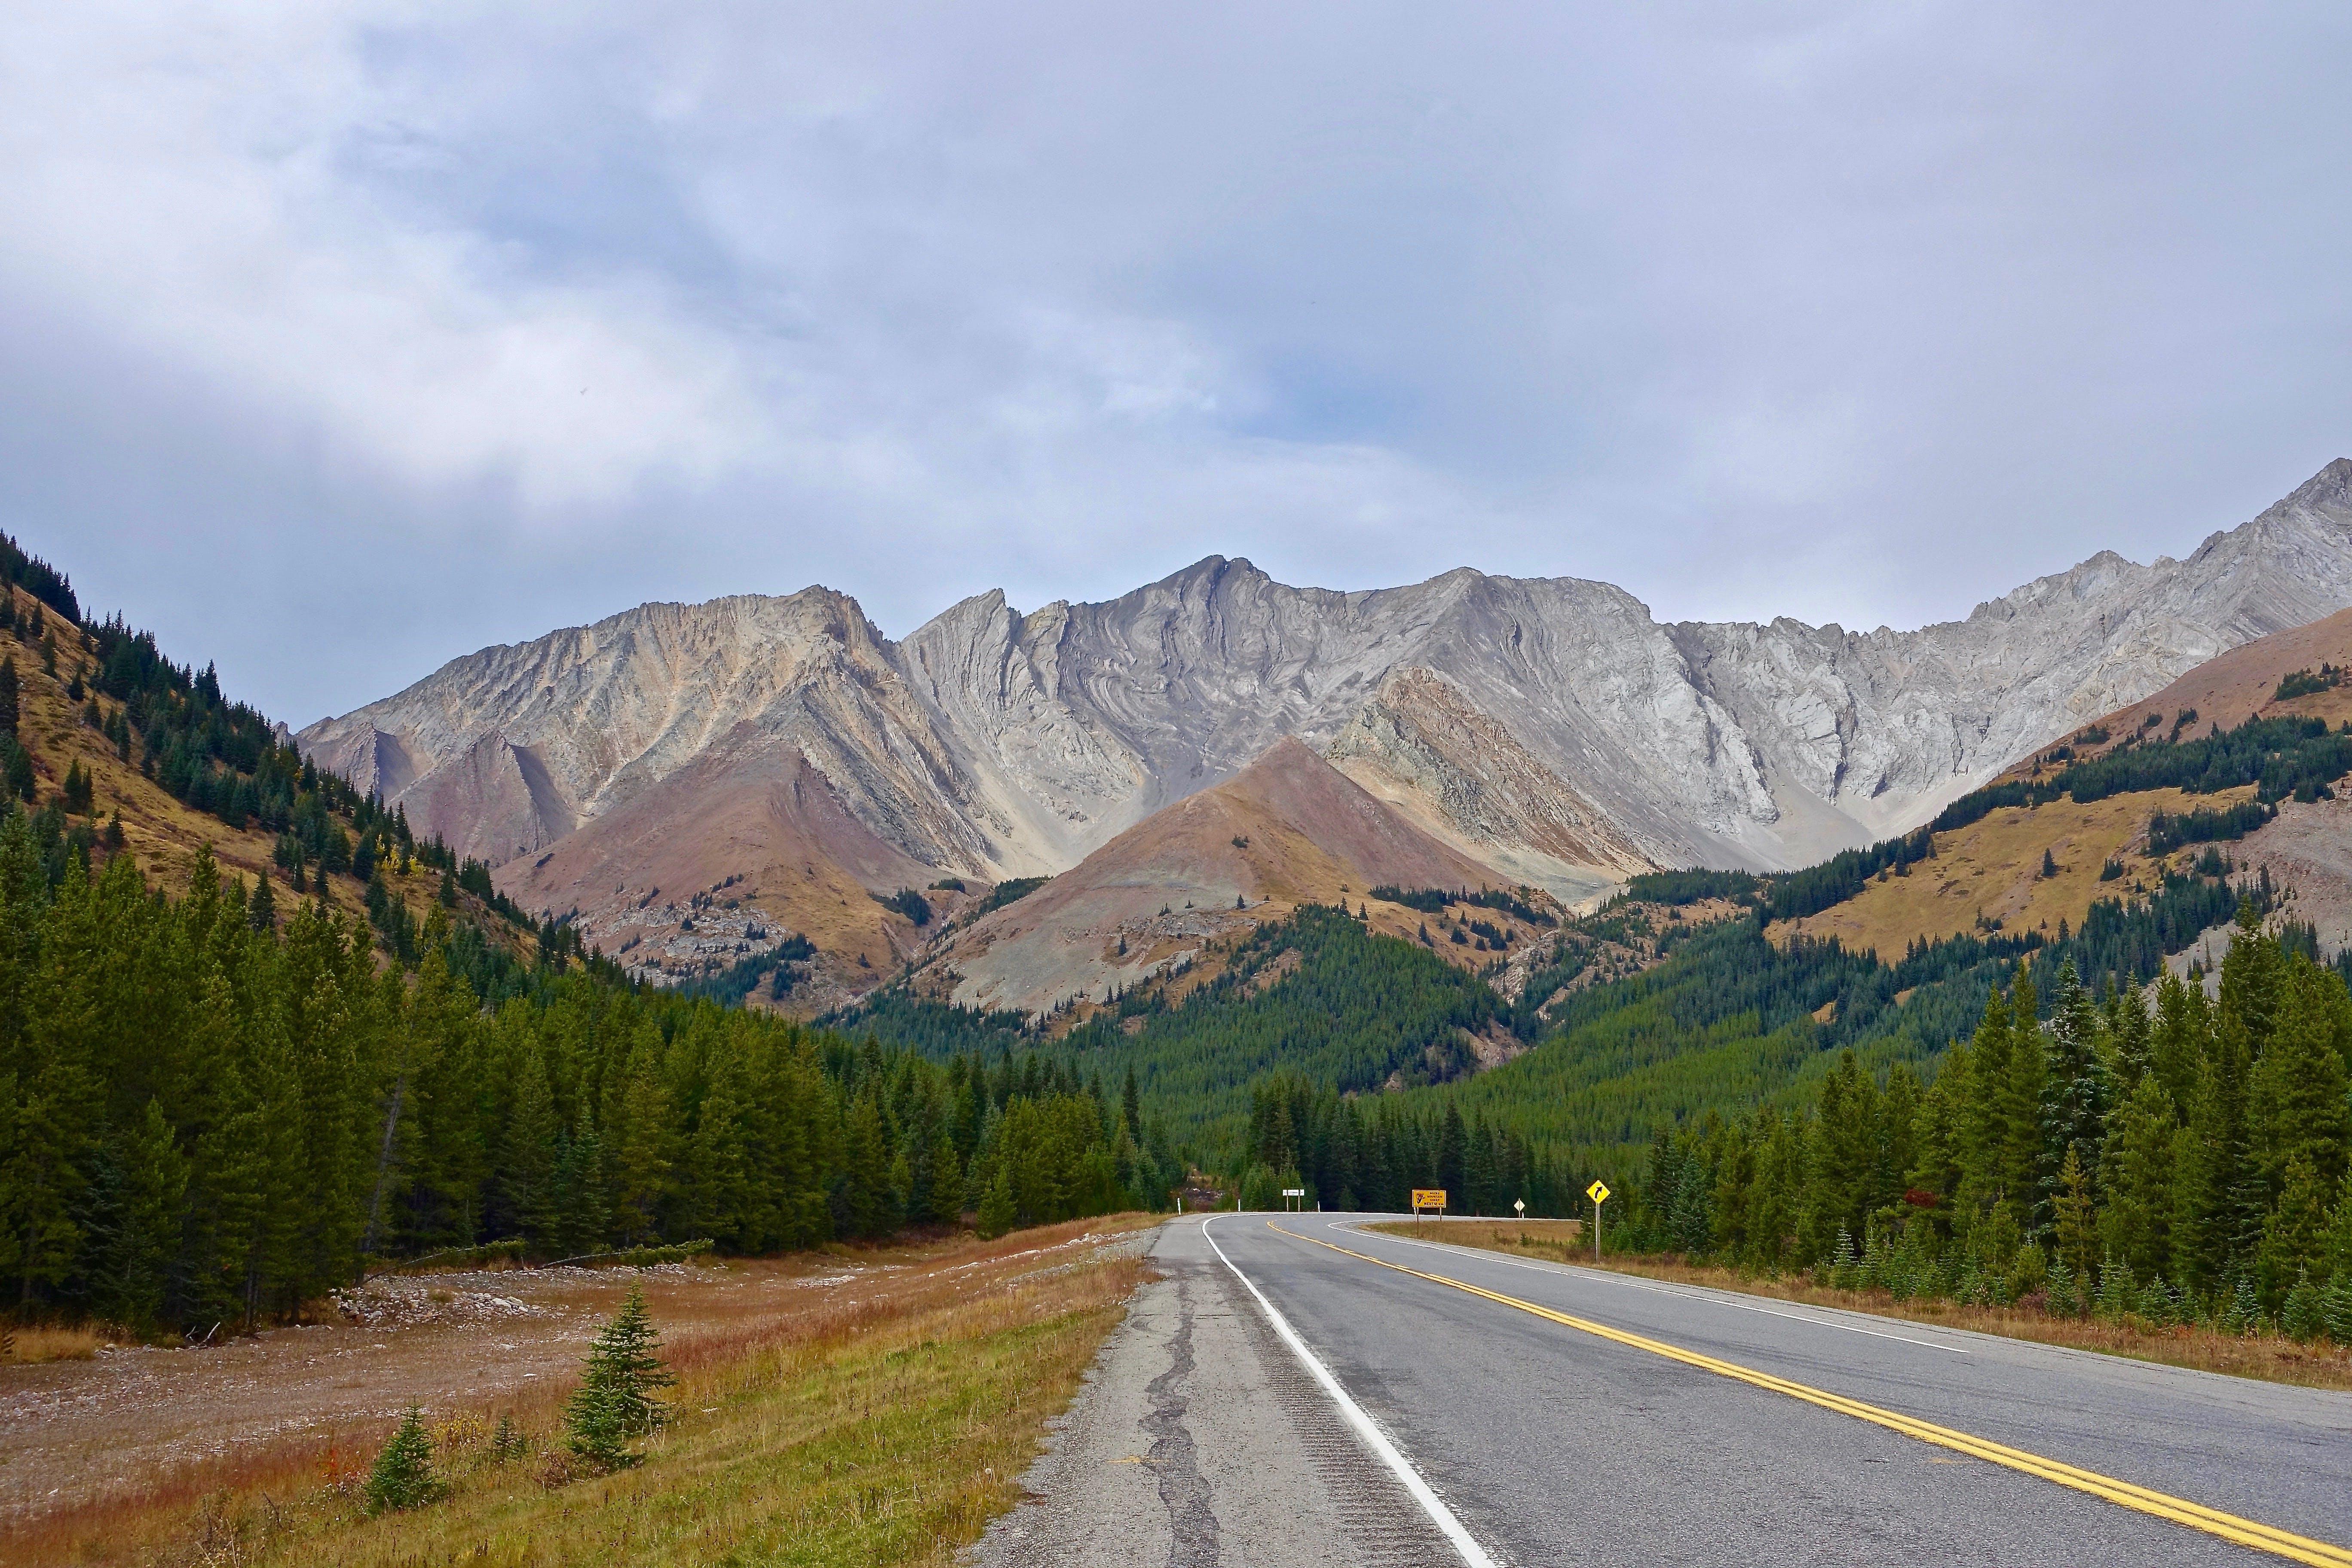 Kostenloses Stock Foto zu autobahn, berg, felsiger berg, gipfel